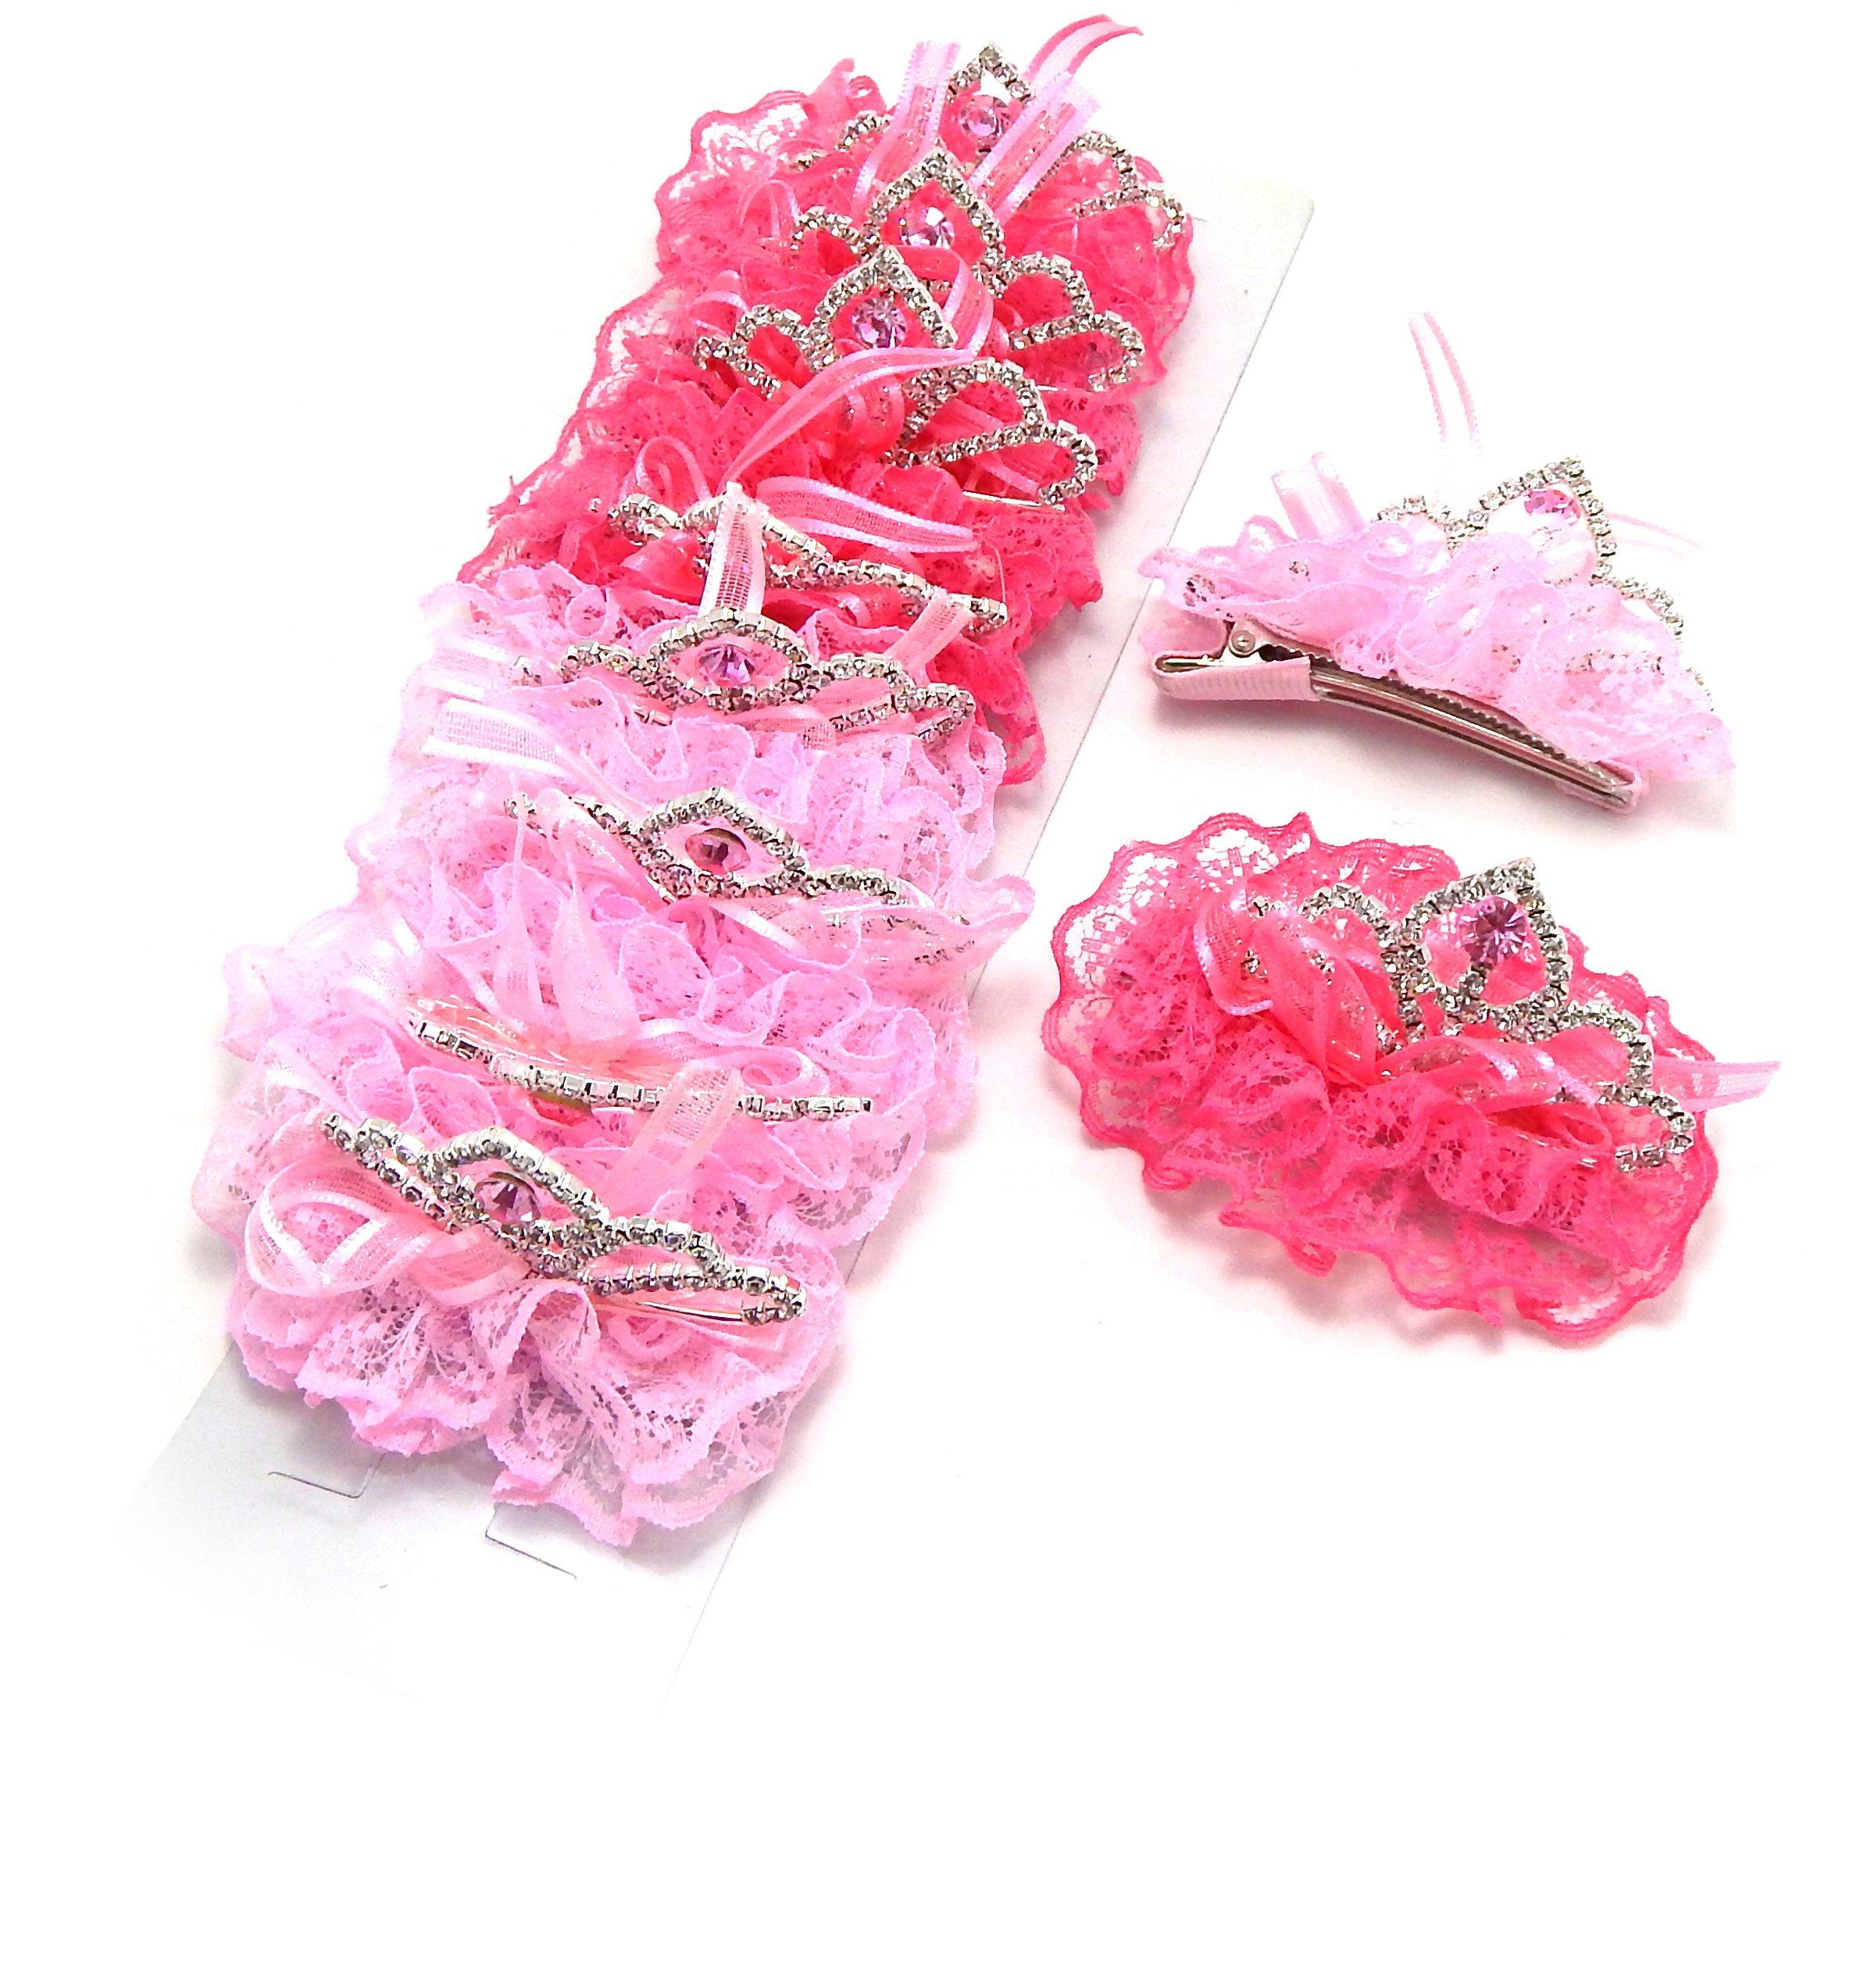 SET OF 10 Baby & Toddler Girl Lace Princess Tiara Alligator Hair Clip with Rhinestones